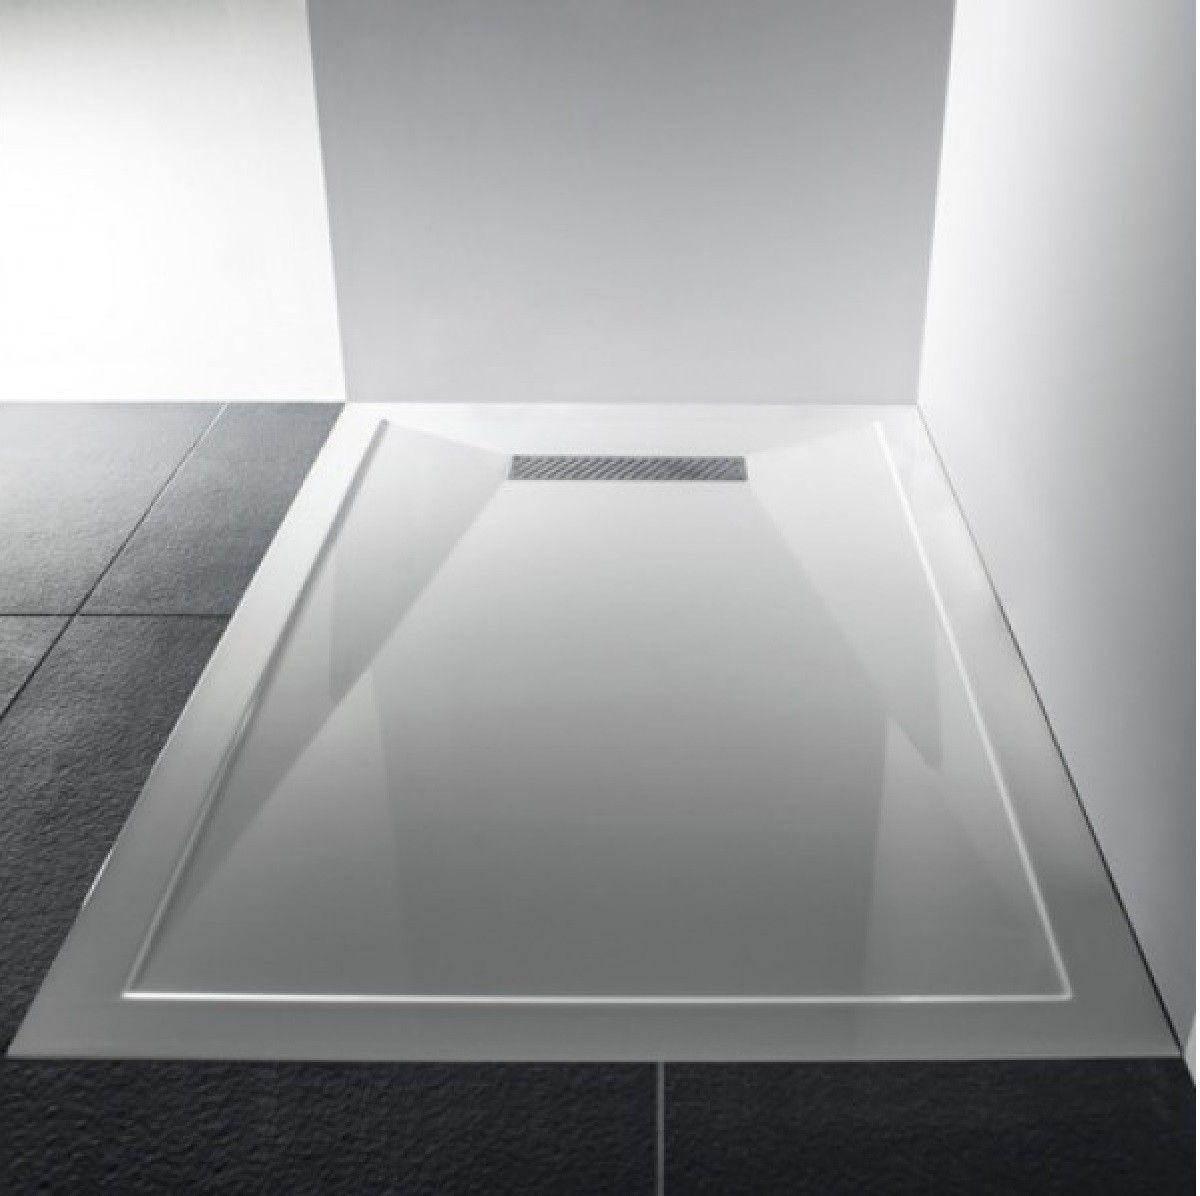 25mm Ultra Slim Shower Tray 1500 x 900 | Bathroom games room ...